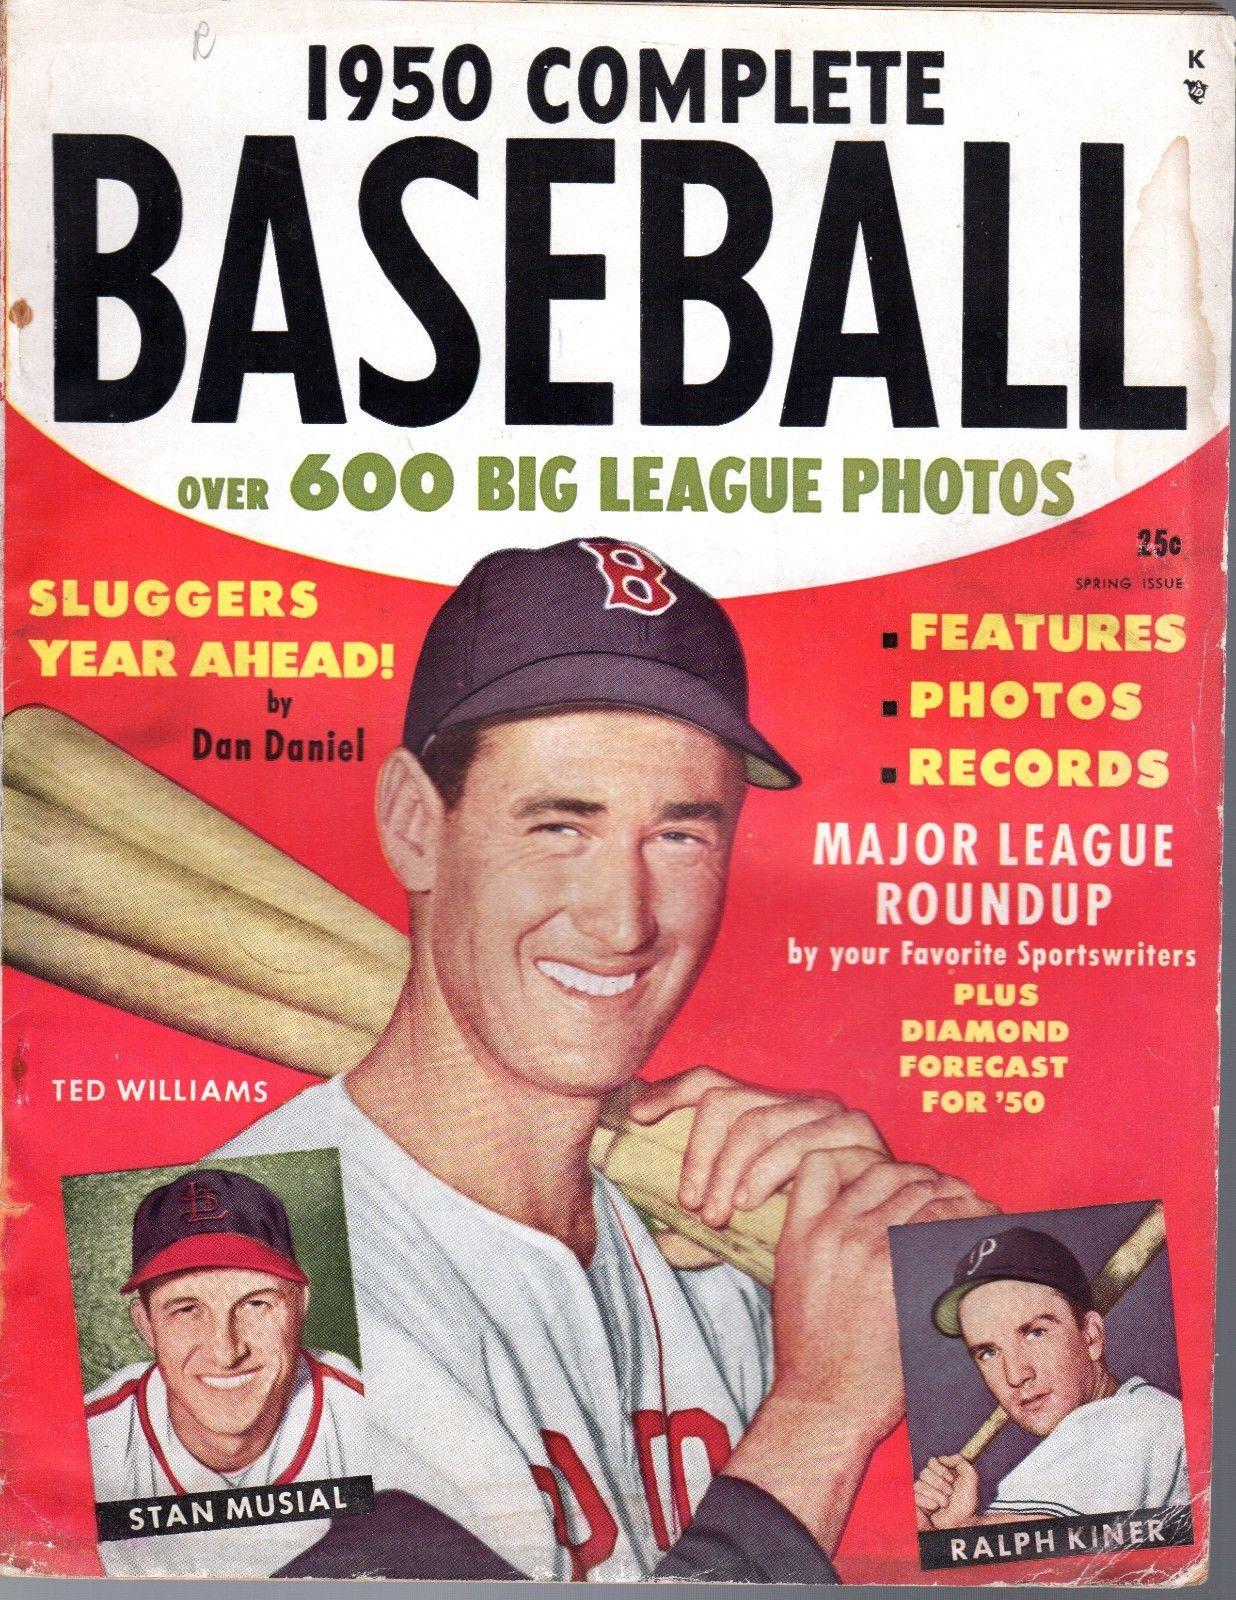 Complete Baseball Vol II 1